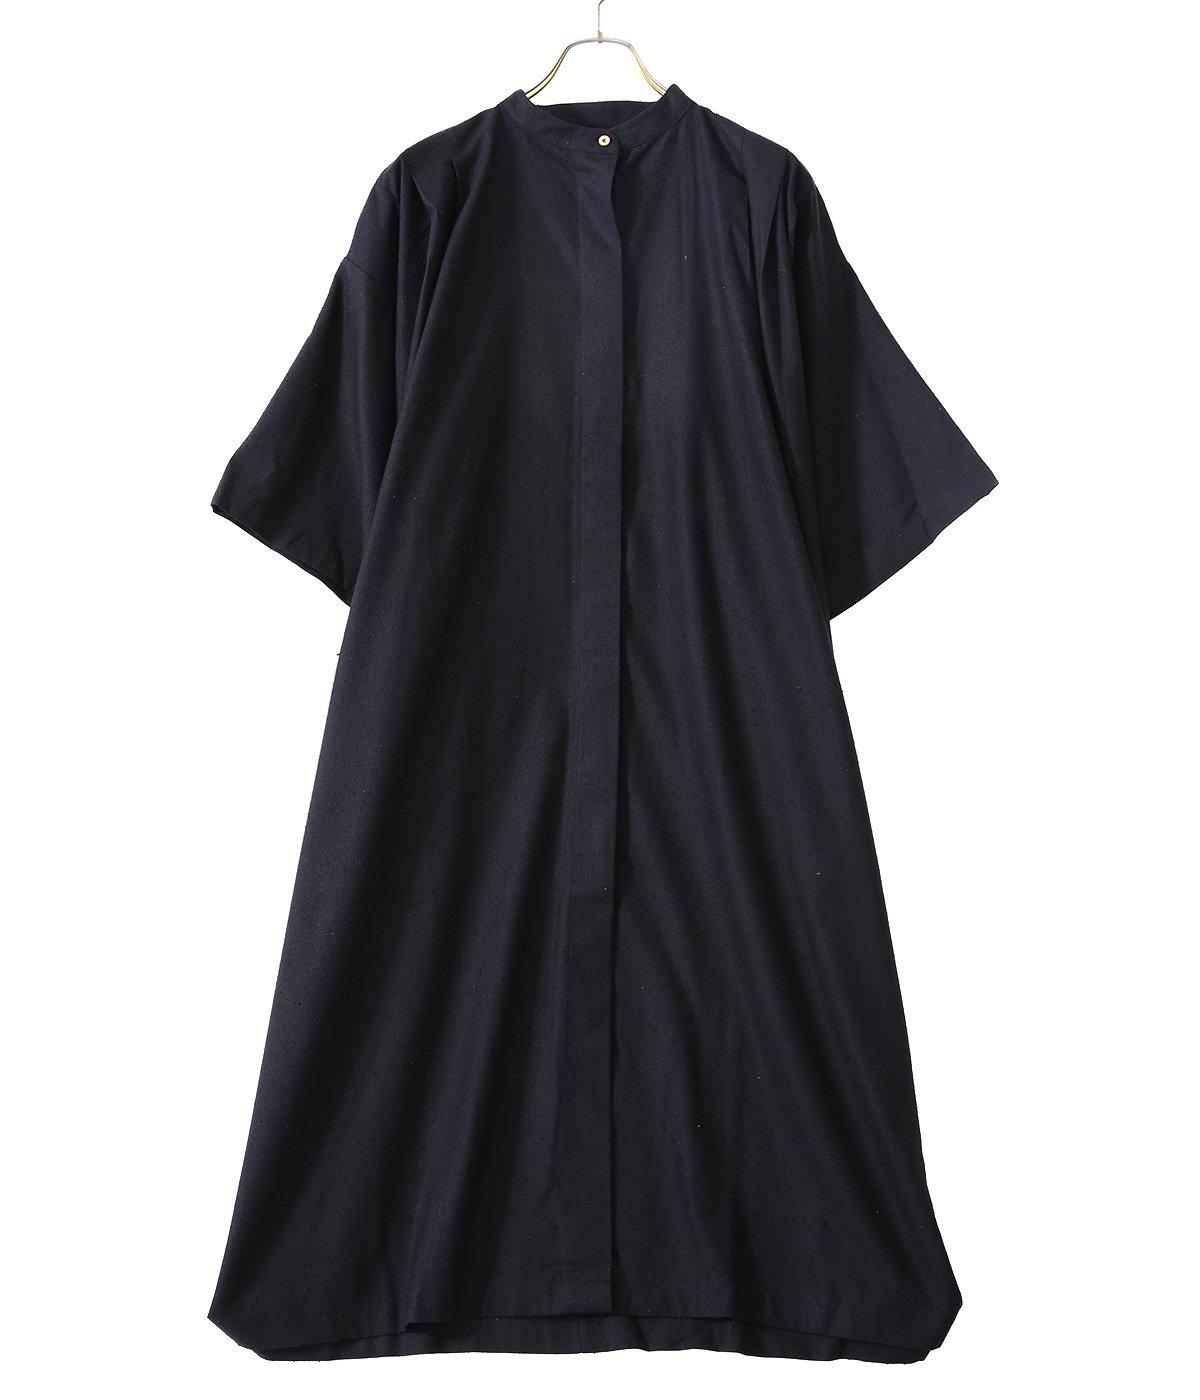 【予約】LENCE DRESS